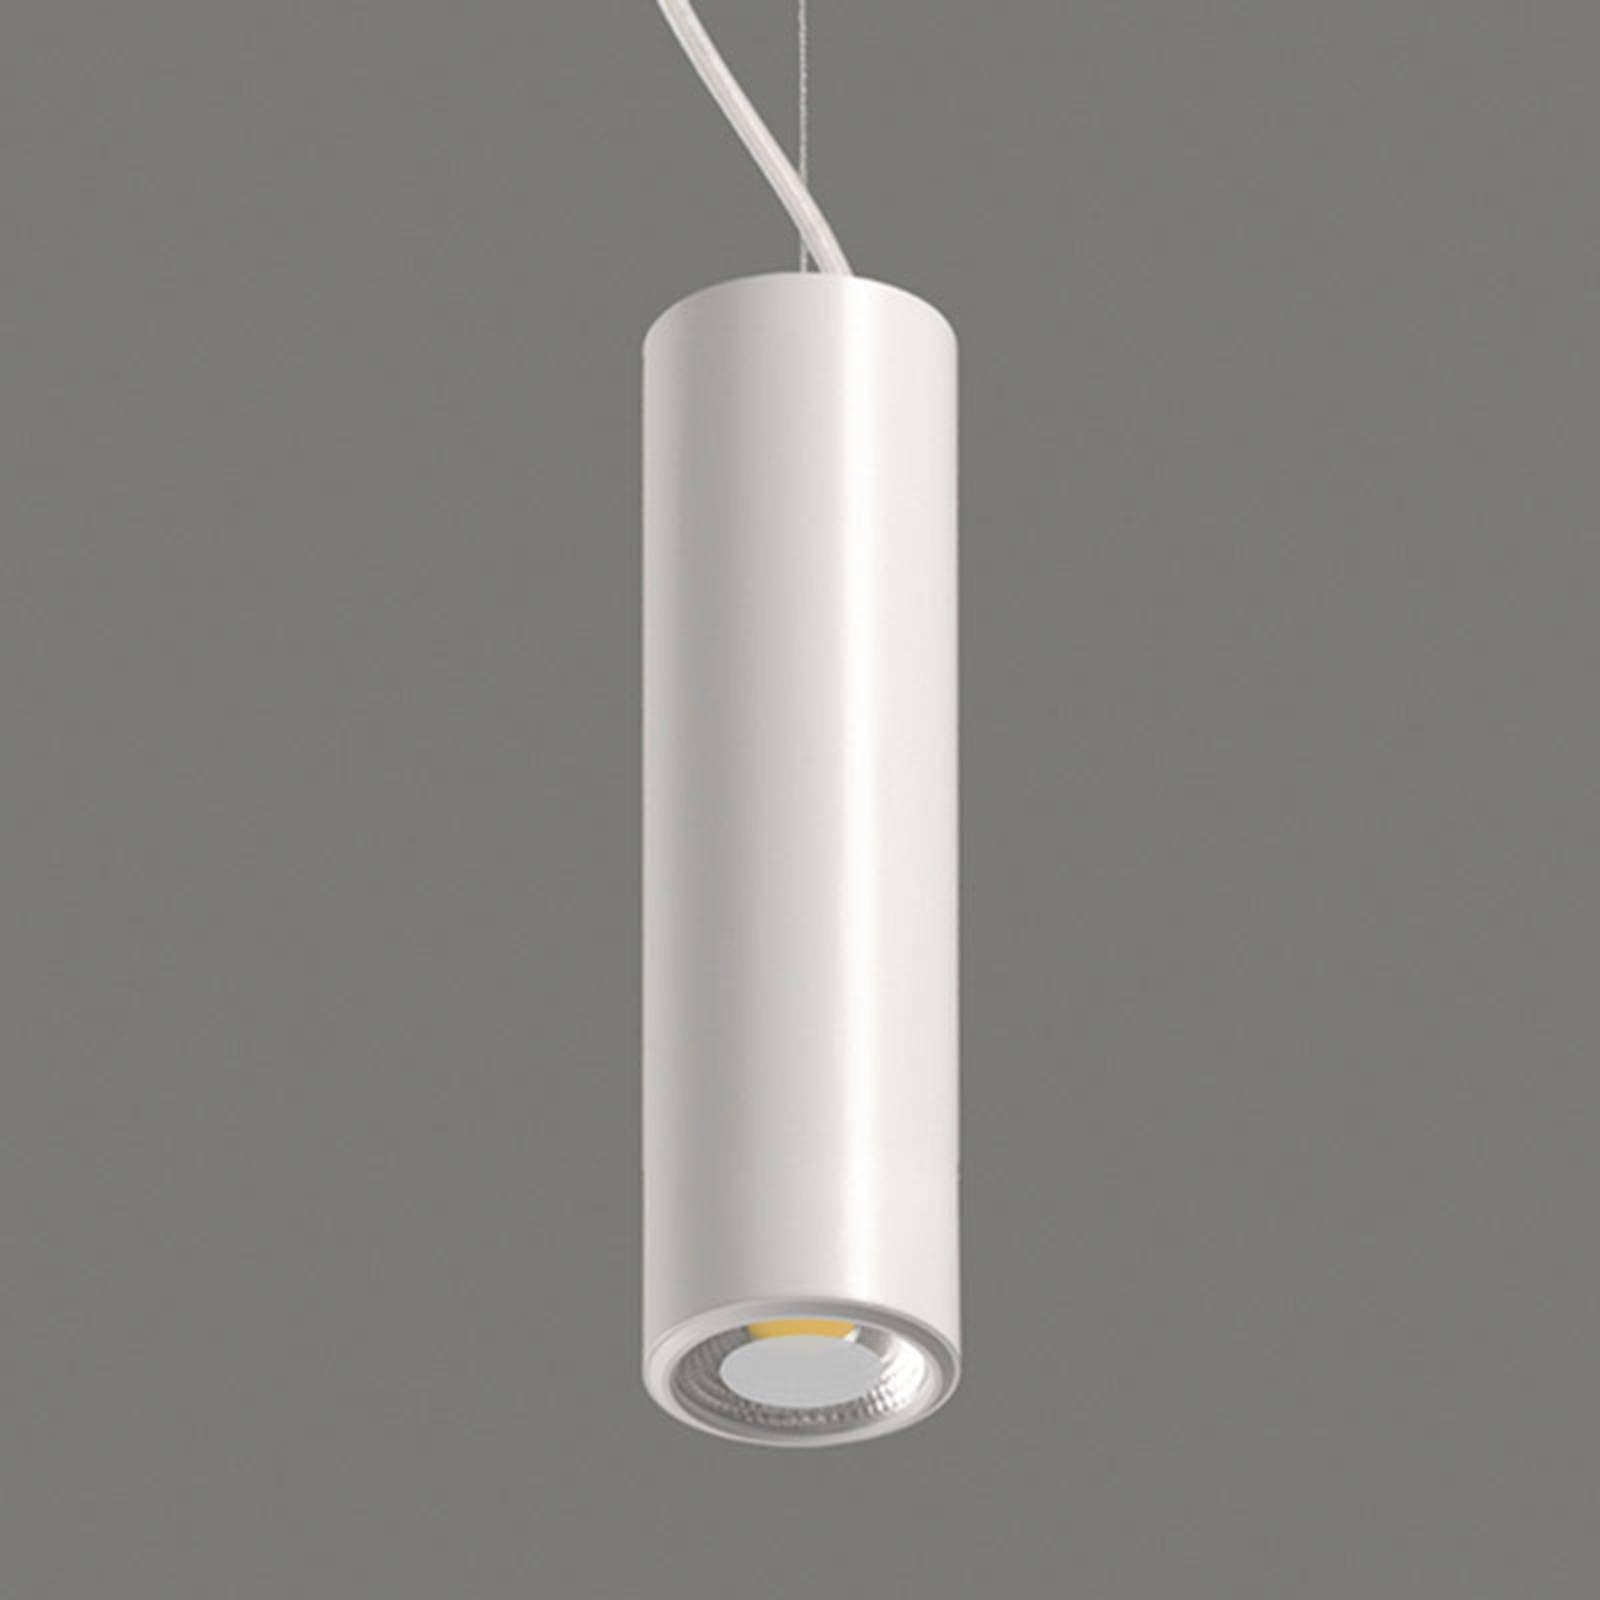 Studio - sylindrisk hvit LED-pendellampe